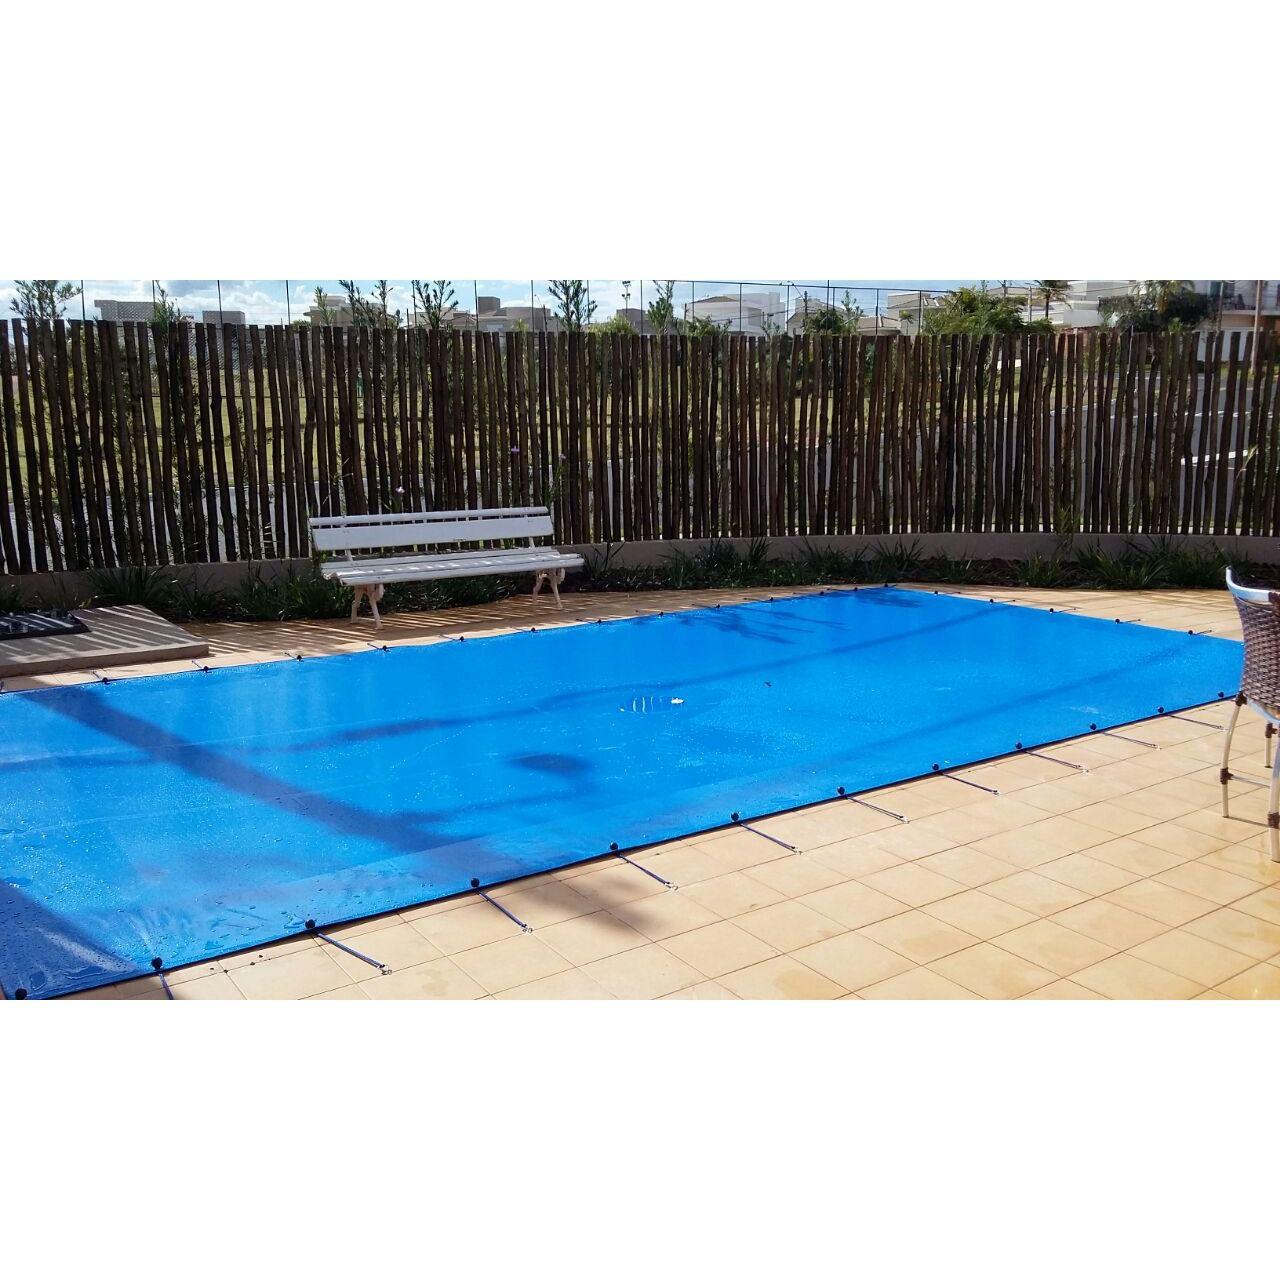 Lona Polietileno Azul 300 Micras - 5,5x5,5